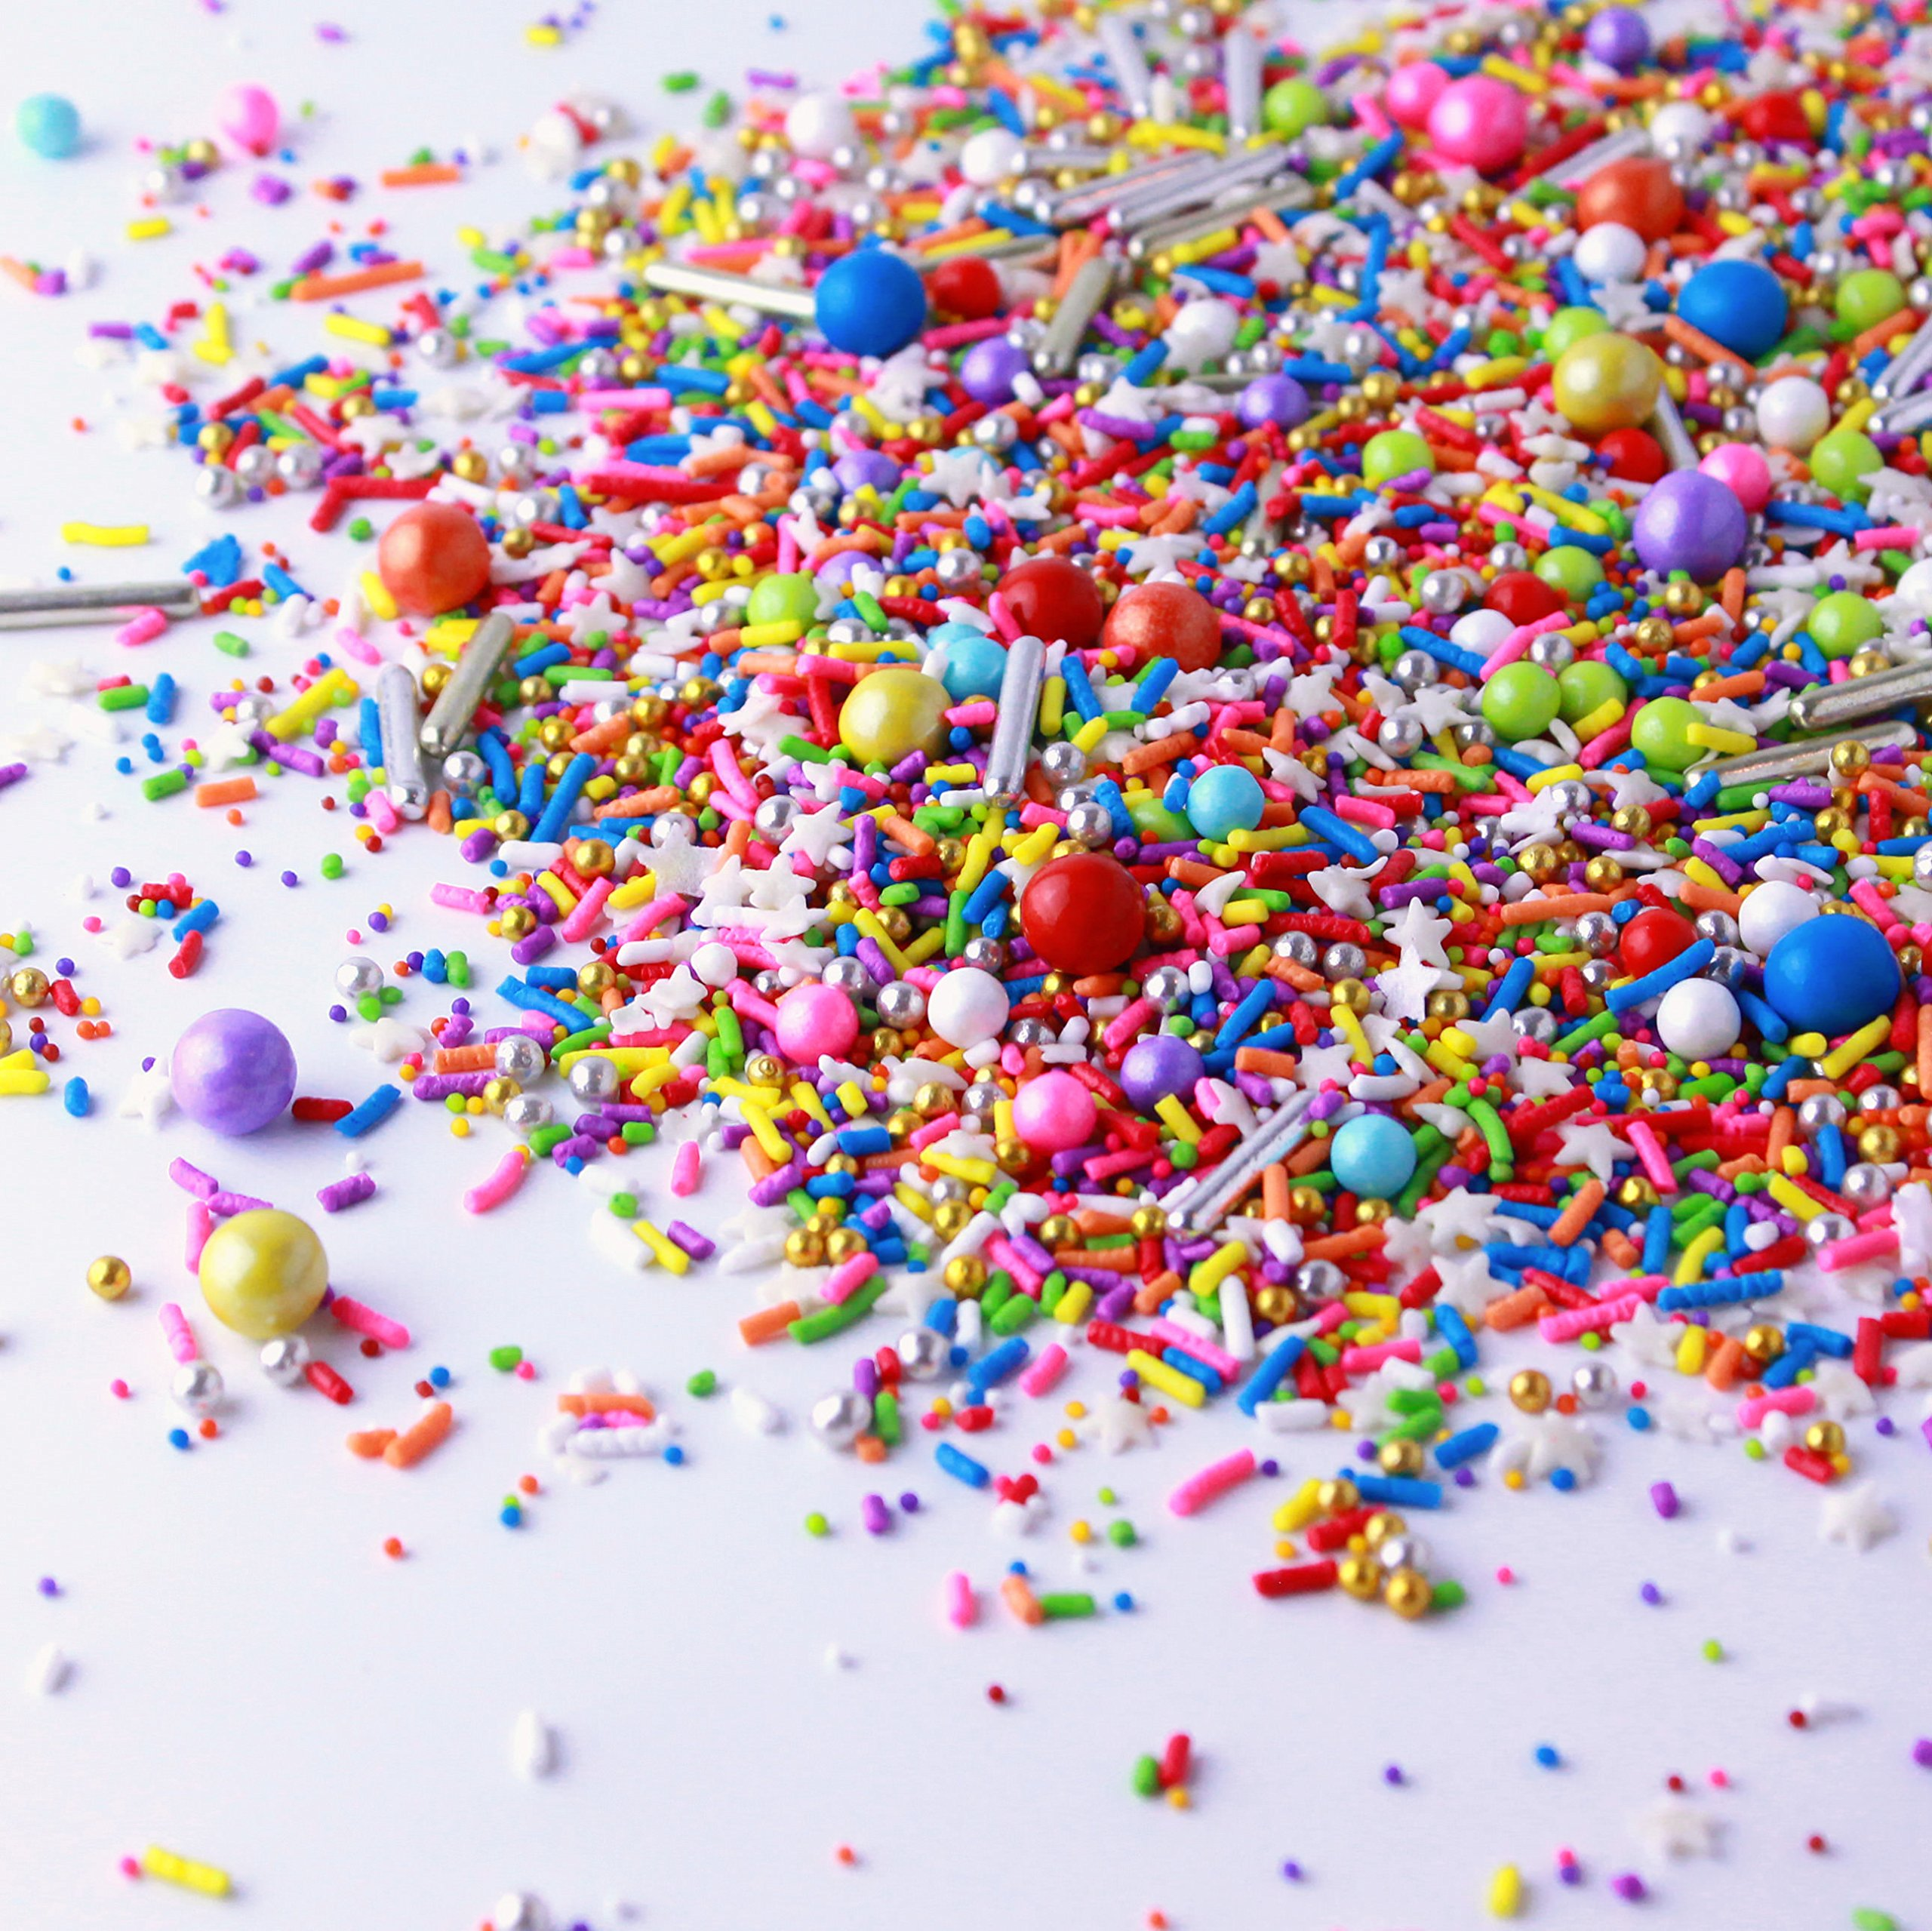 Rainbow Road Sprinkle Mix, Birthday Sprinkles, Cake Sprinkles, Metallic Sprinkles, Unicorn Sprinkles, 4oz by SPRINKLE POP